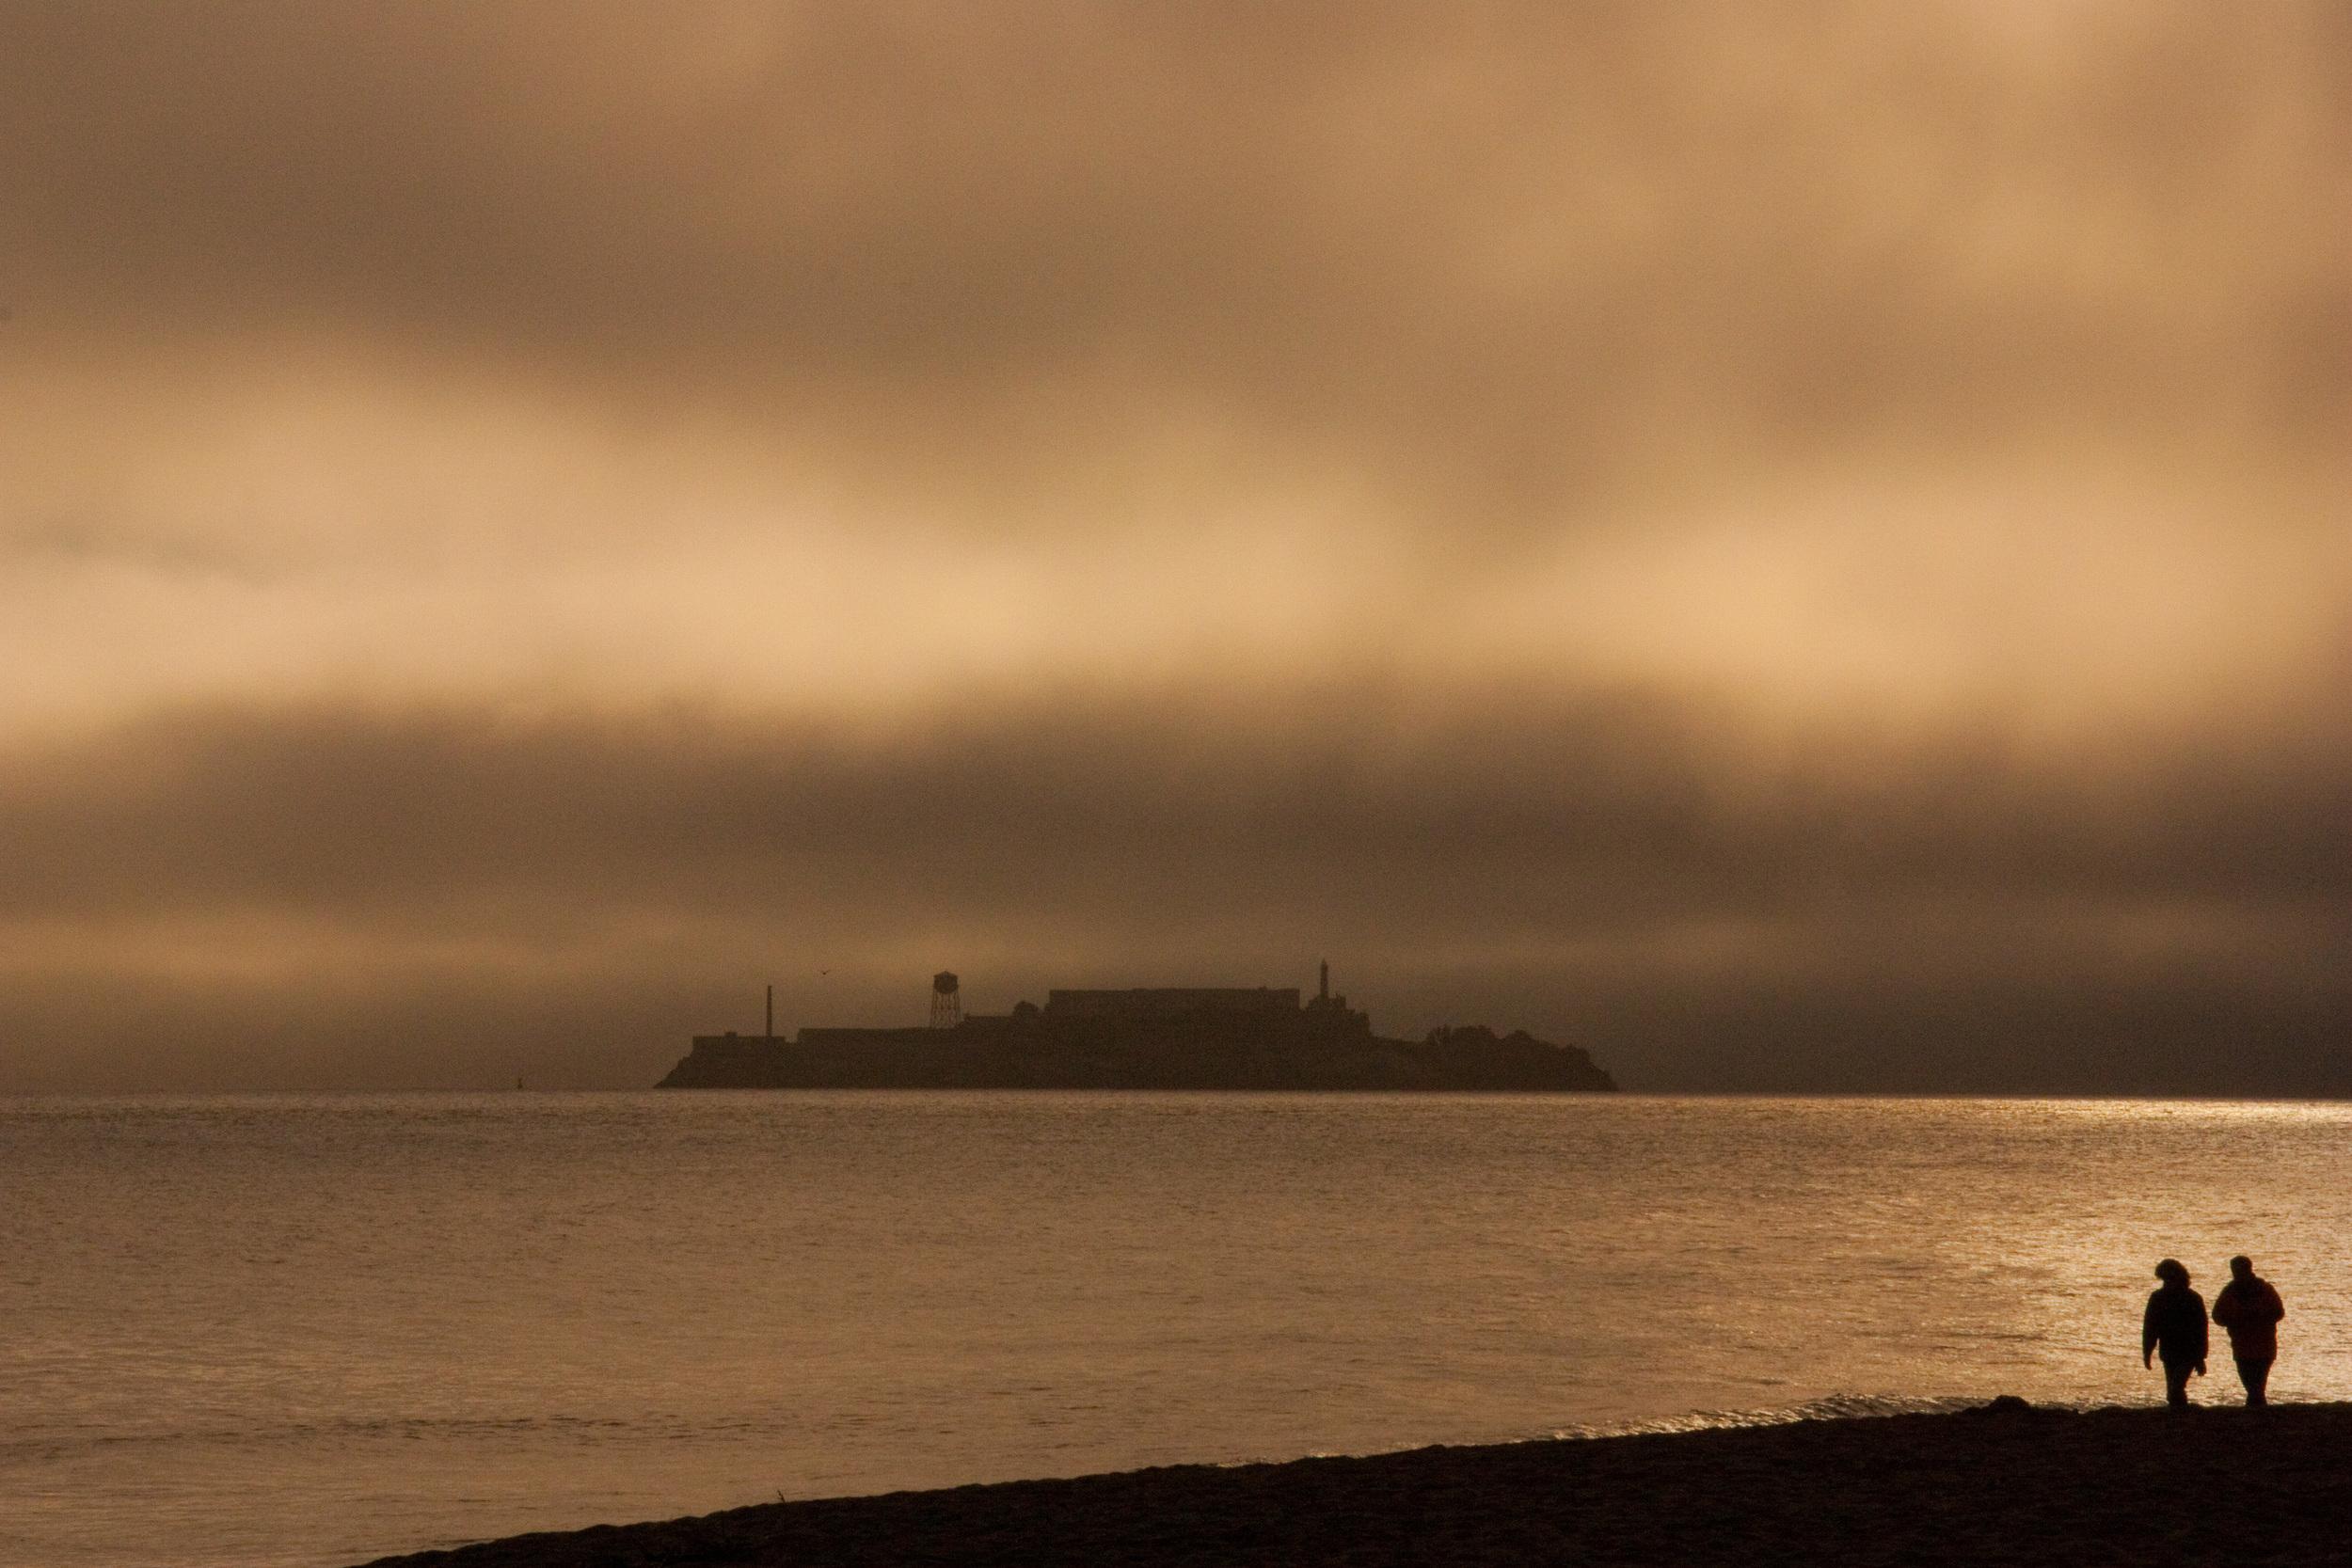 Storm over Alcatraz San Francisco California